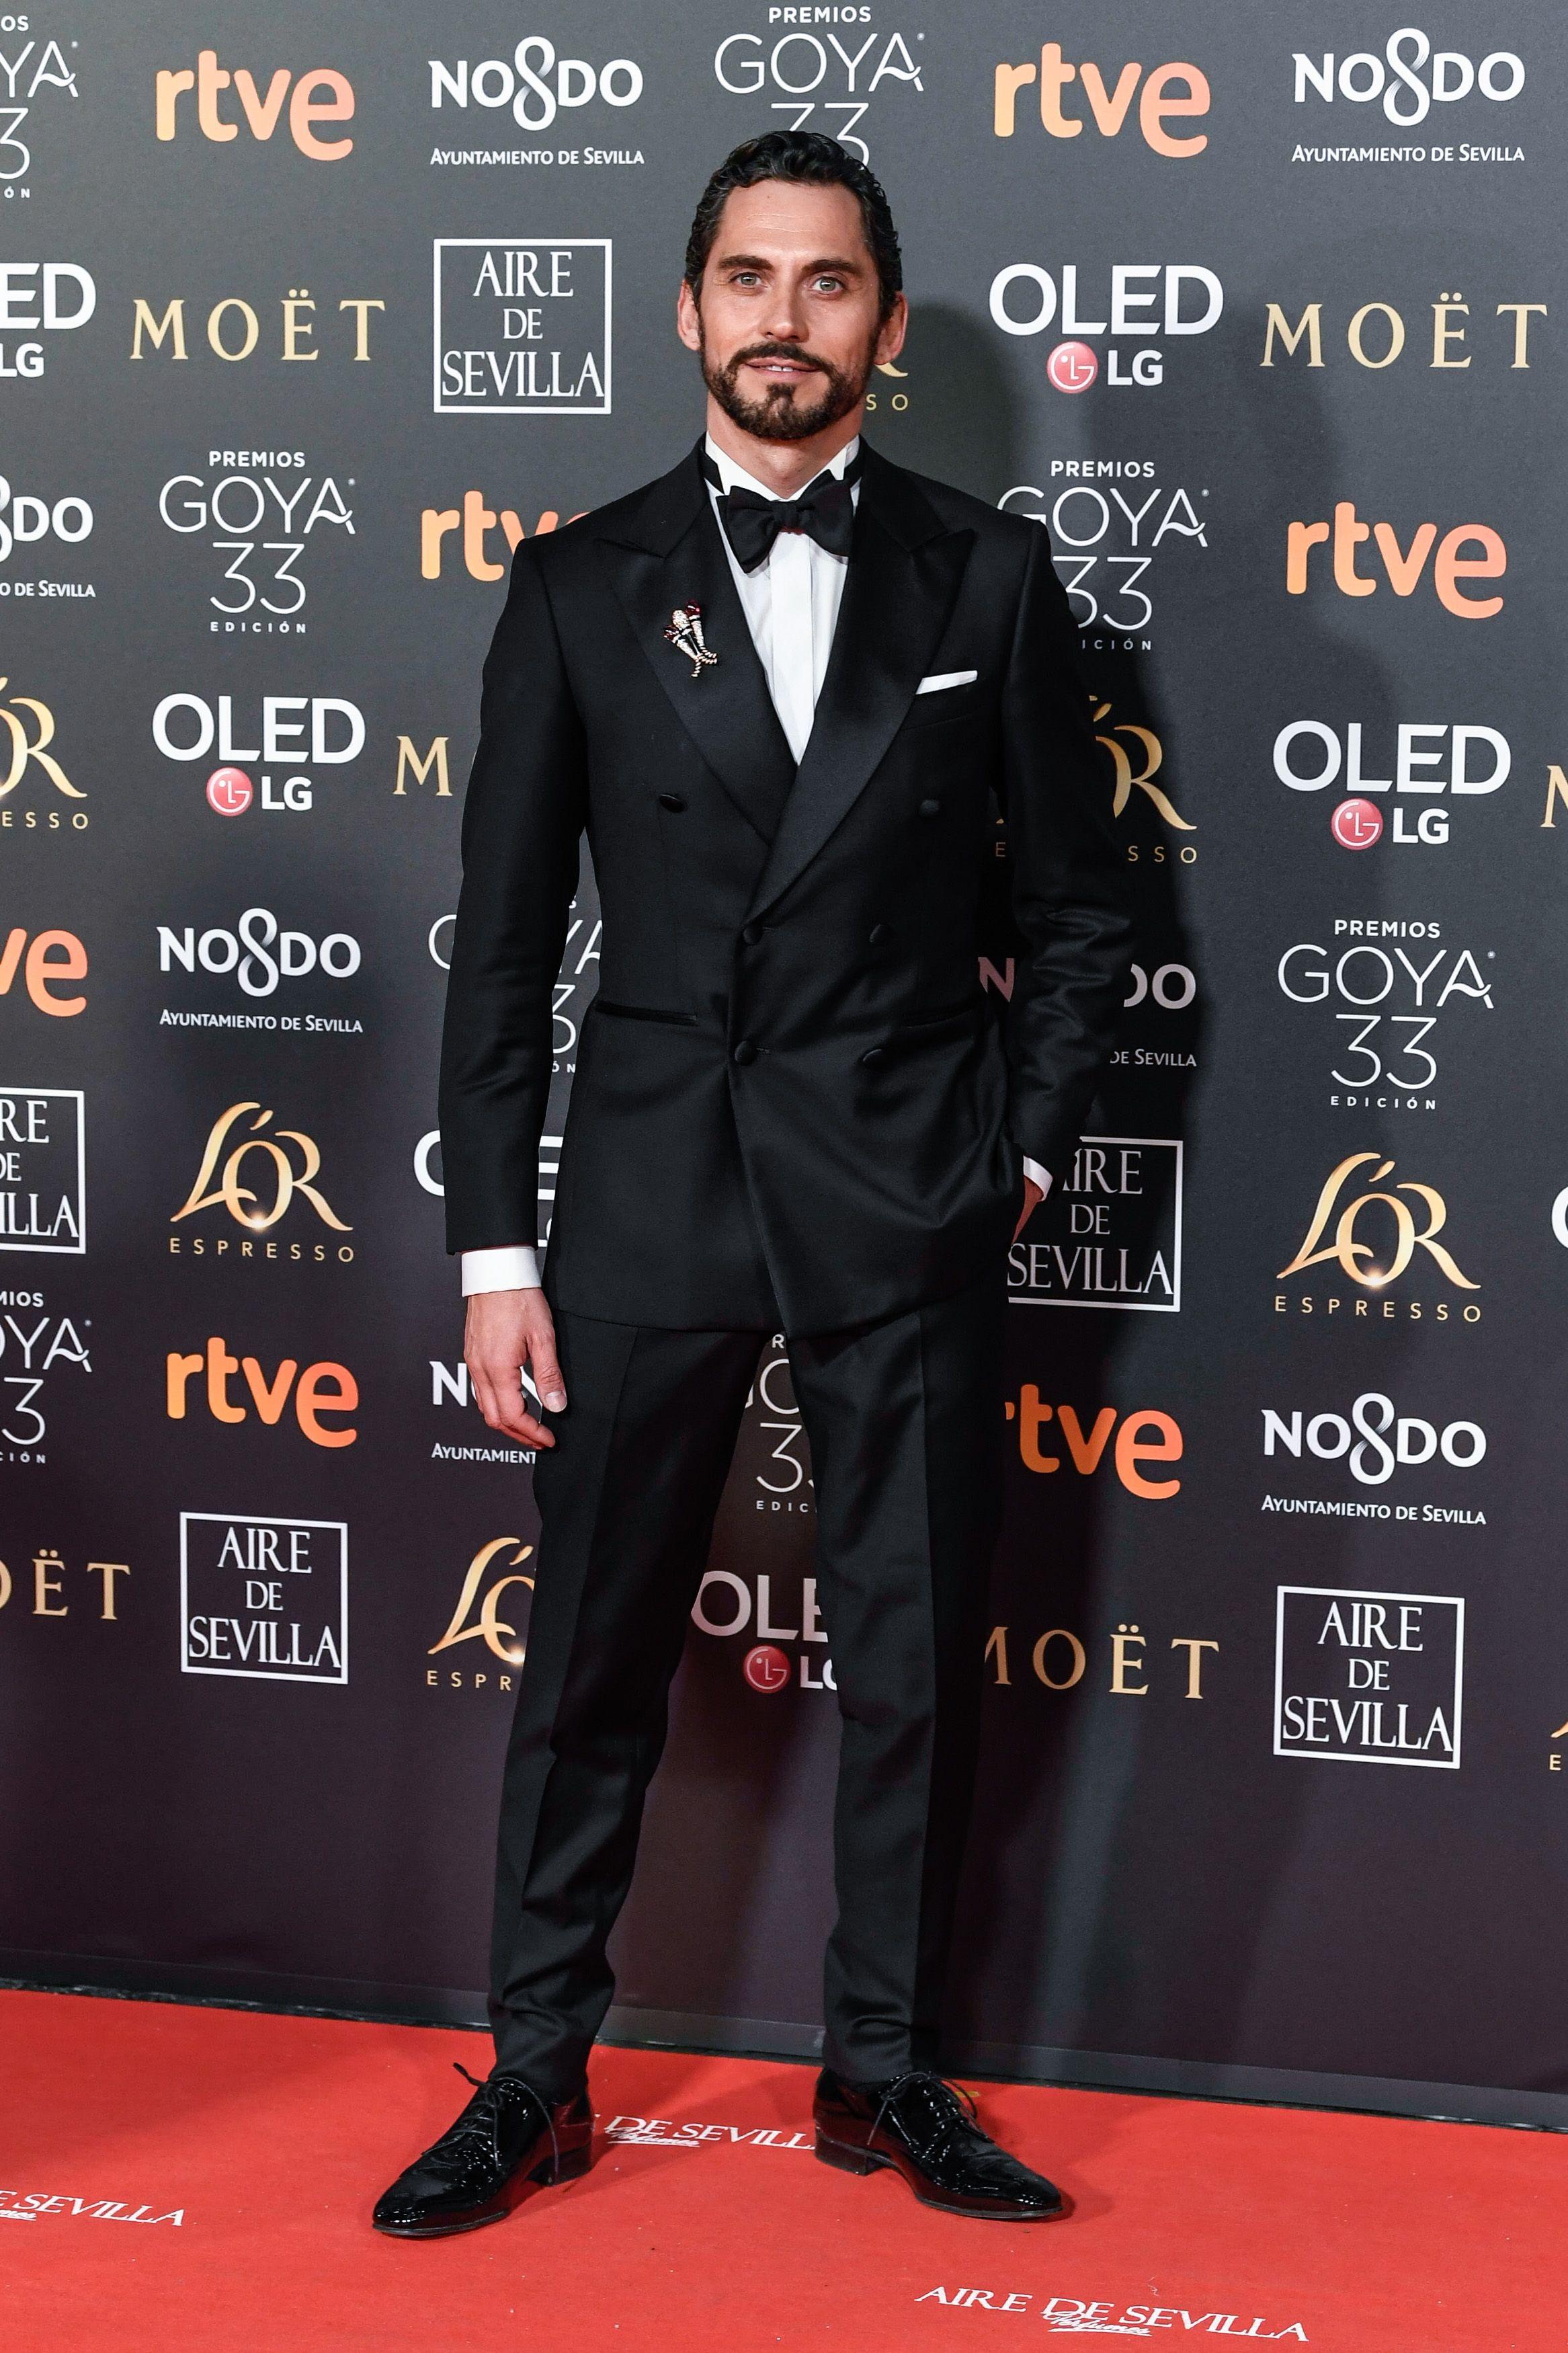 Premios Goya 2019 Alfombra Roja